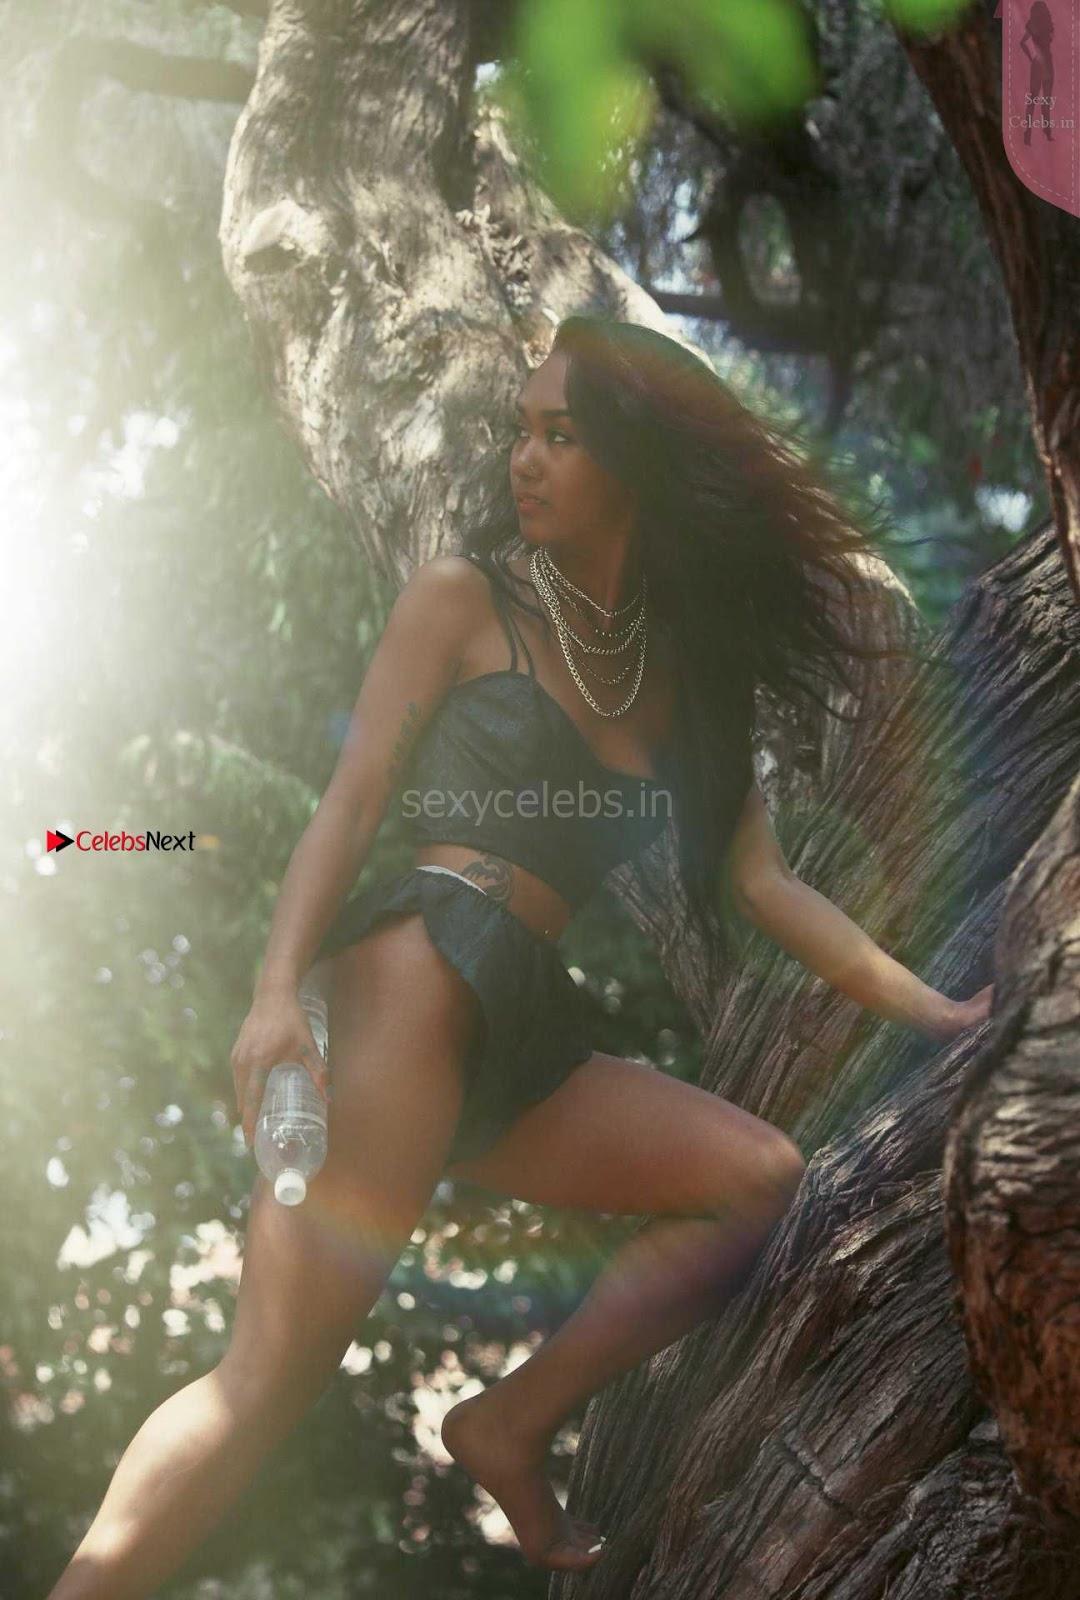 Lailanni Hussein Sexy Bikini in Jungle promoting 138 Waters ~ SexyCelebs.in Exclusive